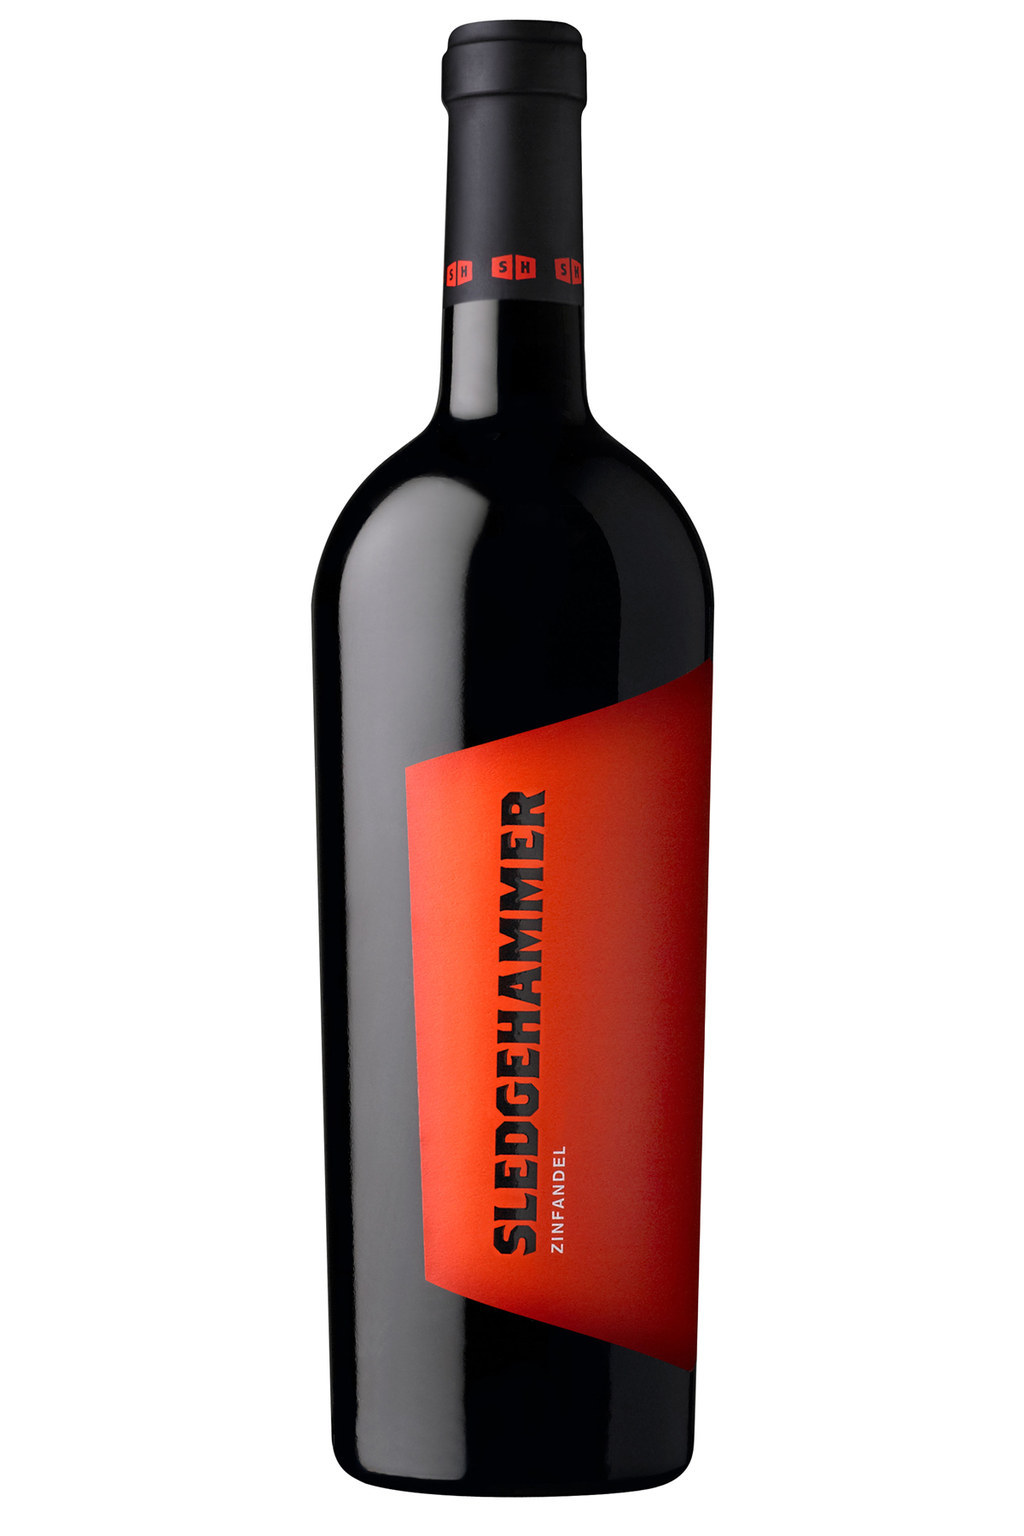 33 Brilliantly Designed Wine Bottles